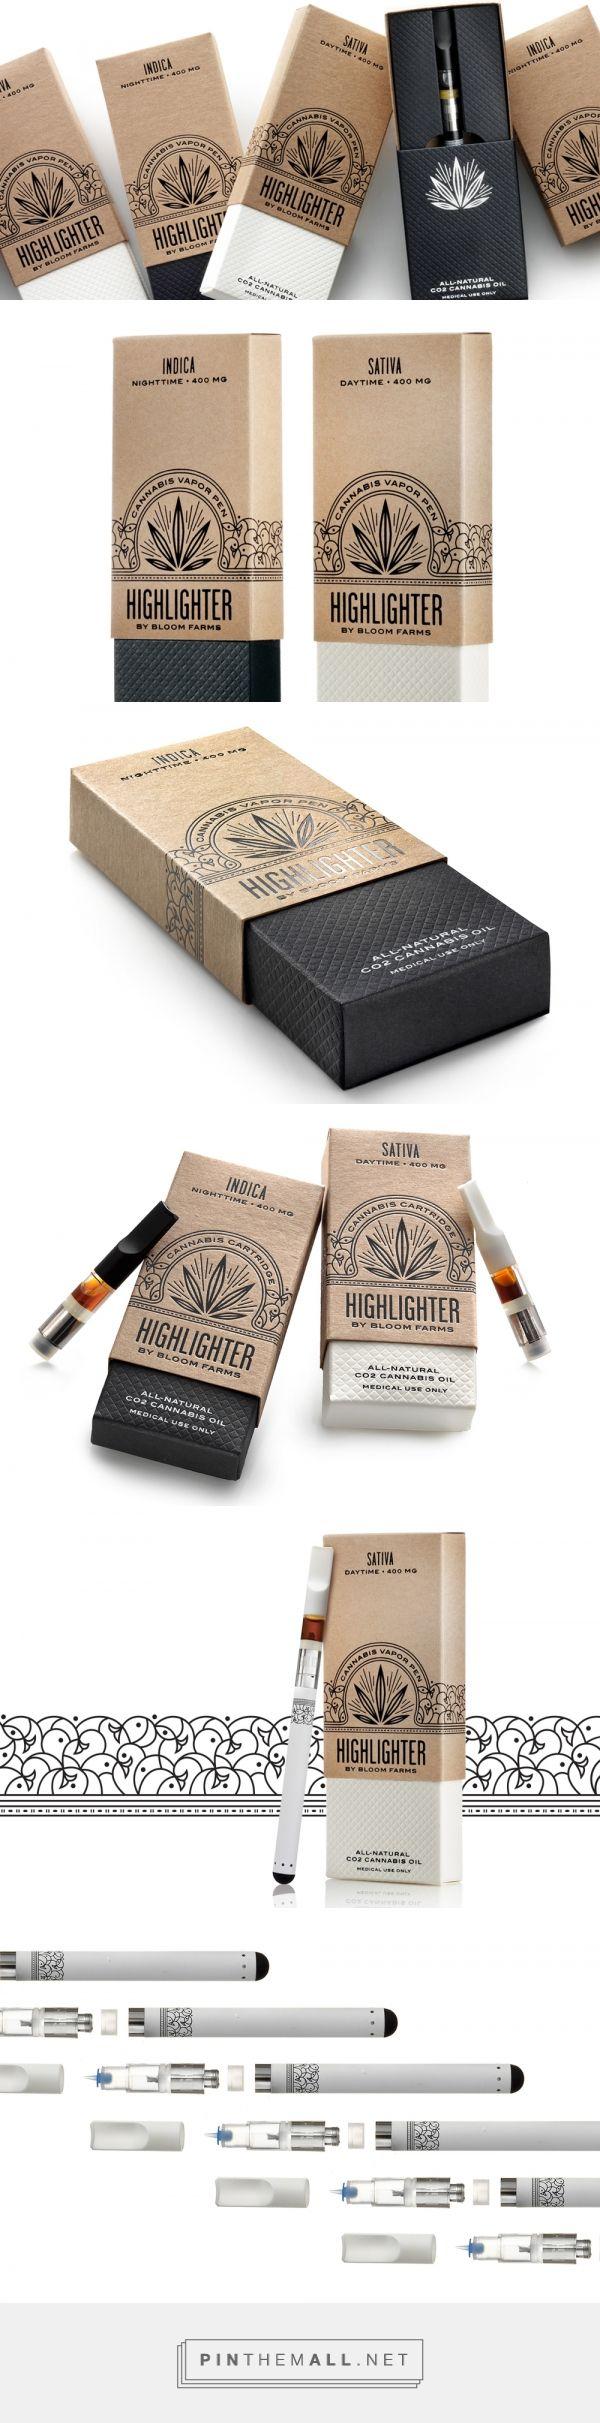 Highlighter by Bloom Farms — The Dieline - Branding & Packaging Design